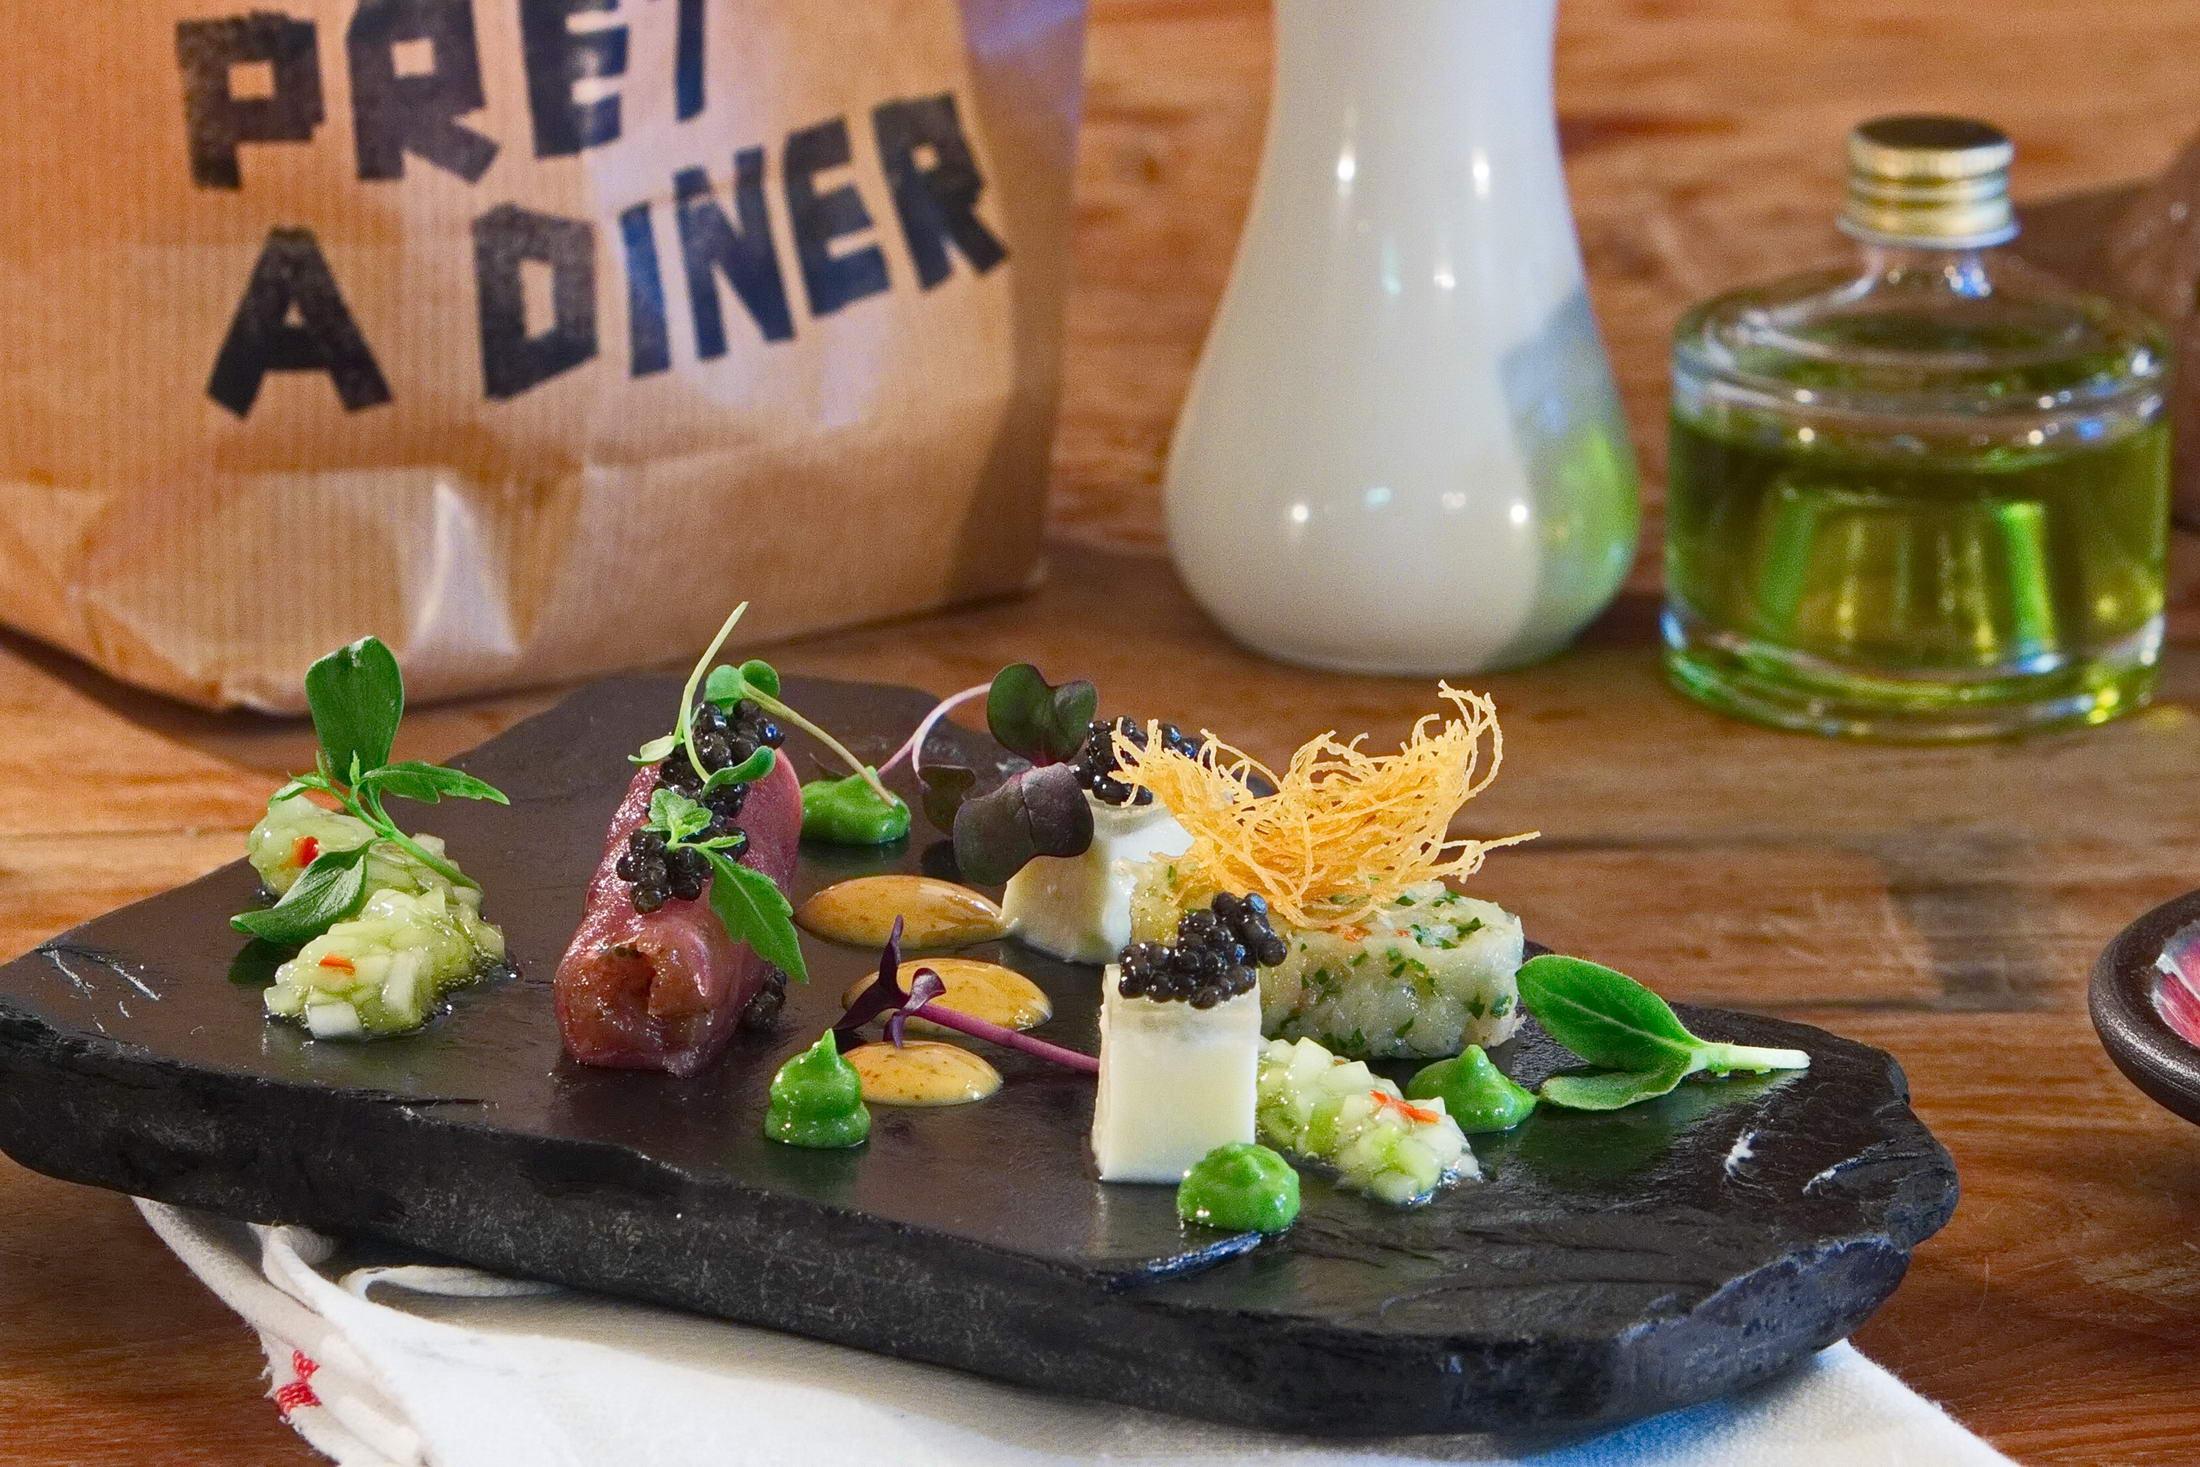 Pret a Diner - Kofler & Kompanie Menu Gregor Anthes